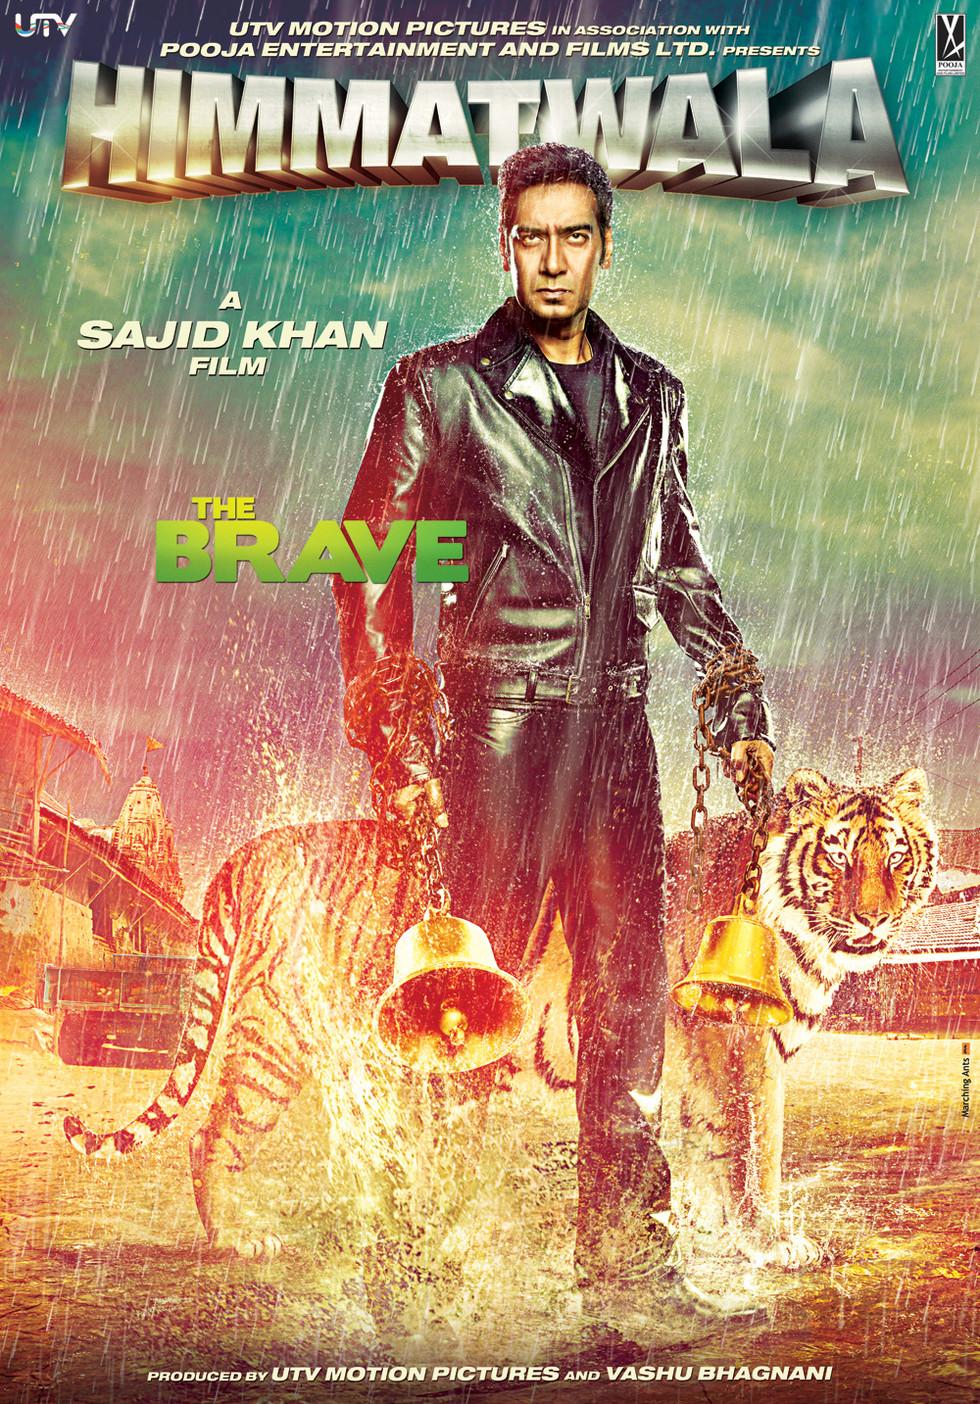 Himmatwala - Movie Poster #4 (Large)